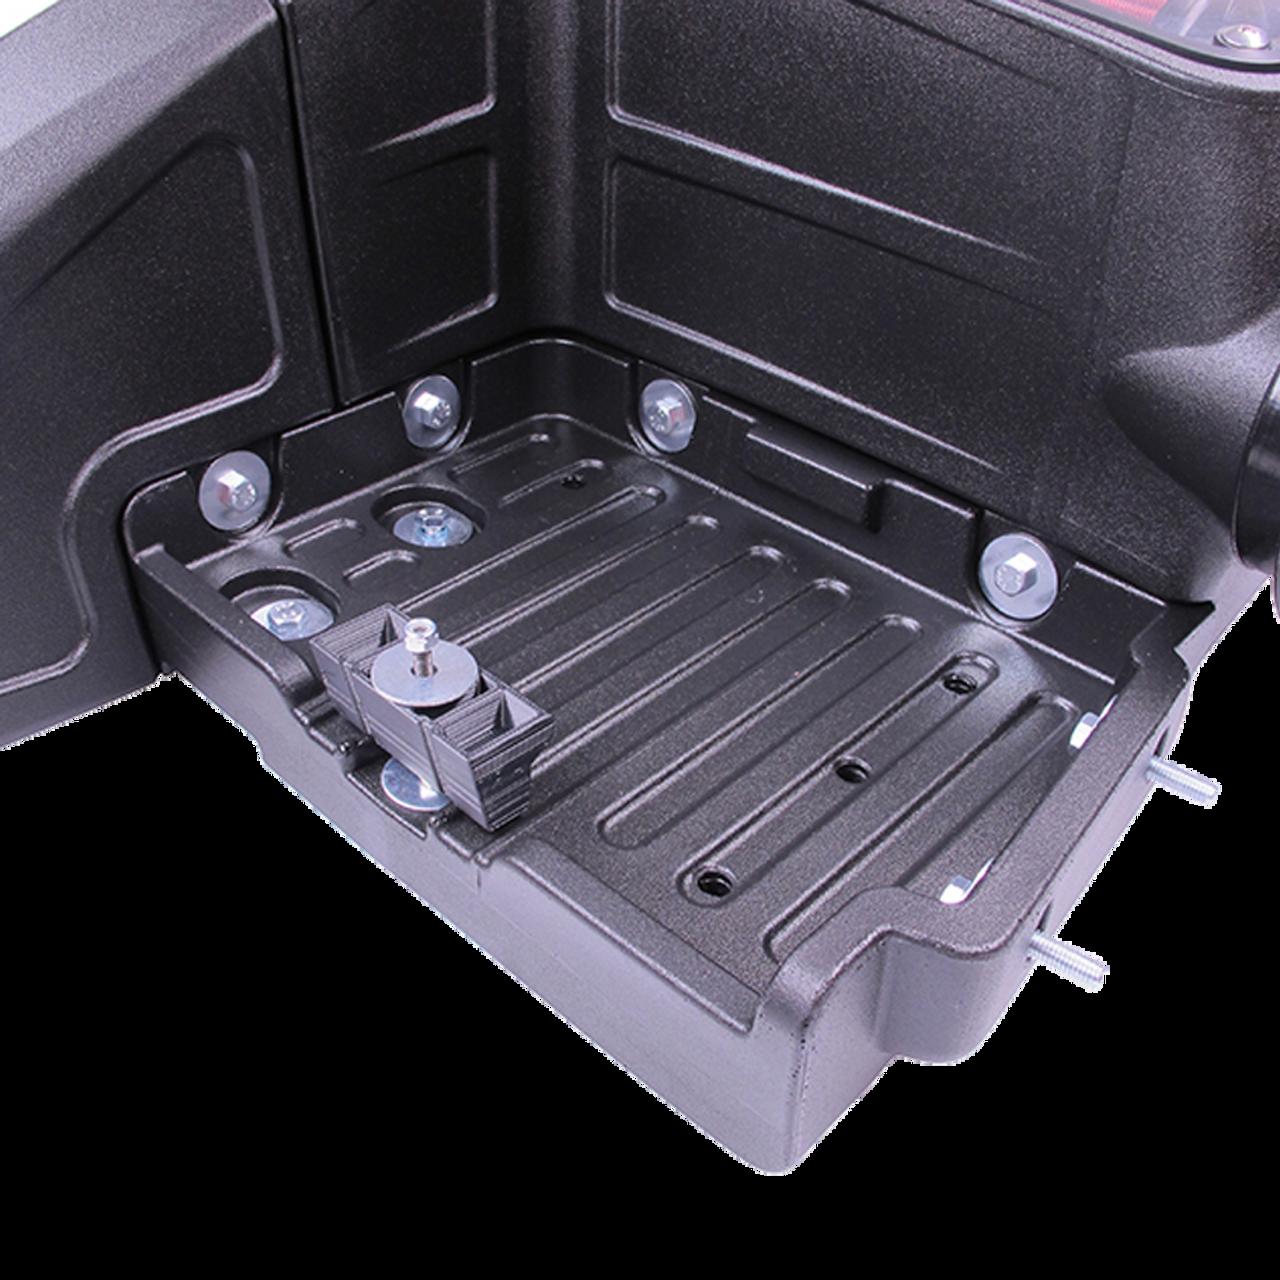 Parking Brake Shoe-Meyle Rear WD EXPRESS 521 08300 500 fits 94-99 Mercedes S320